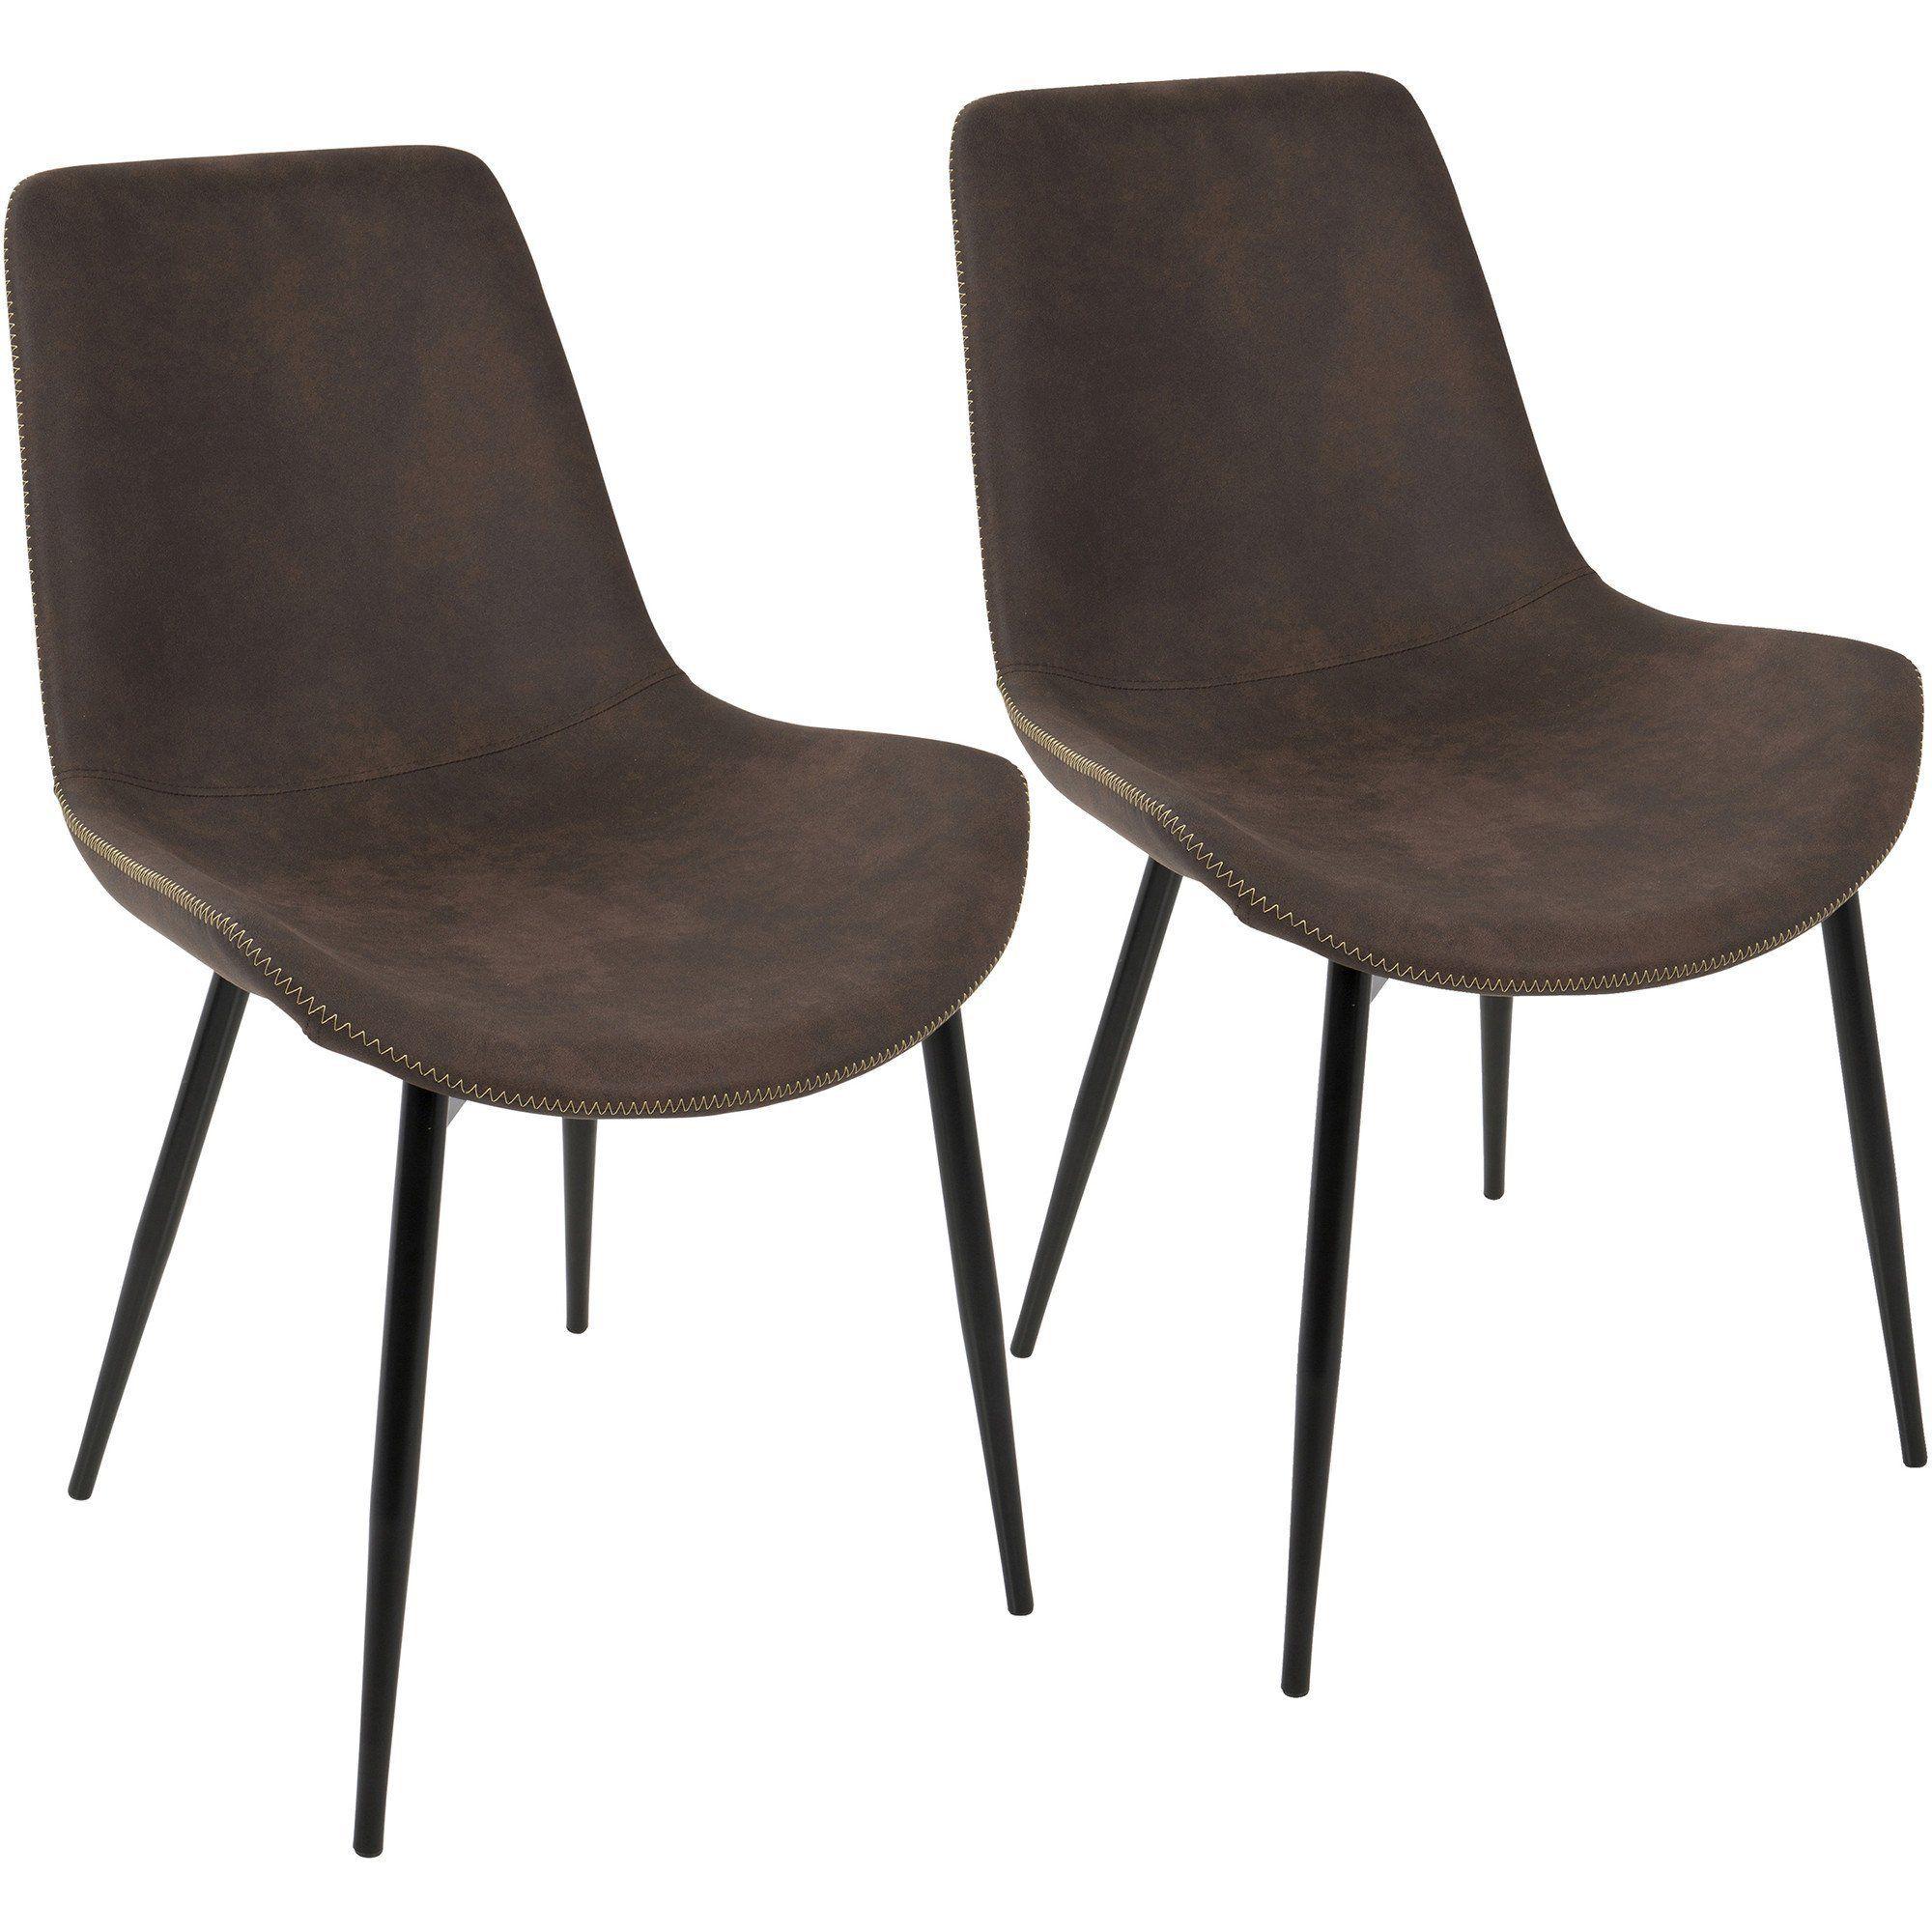 duke industrial dining chairs black espresso set of 2 home rh pinterest ca